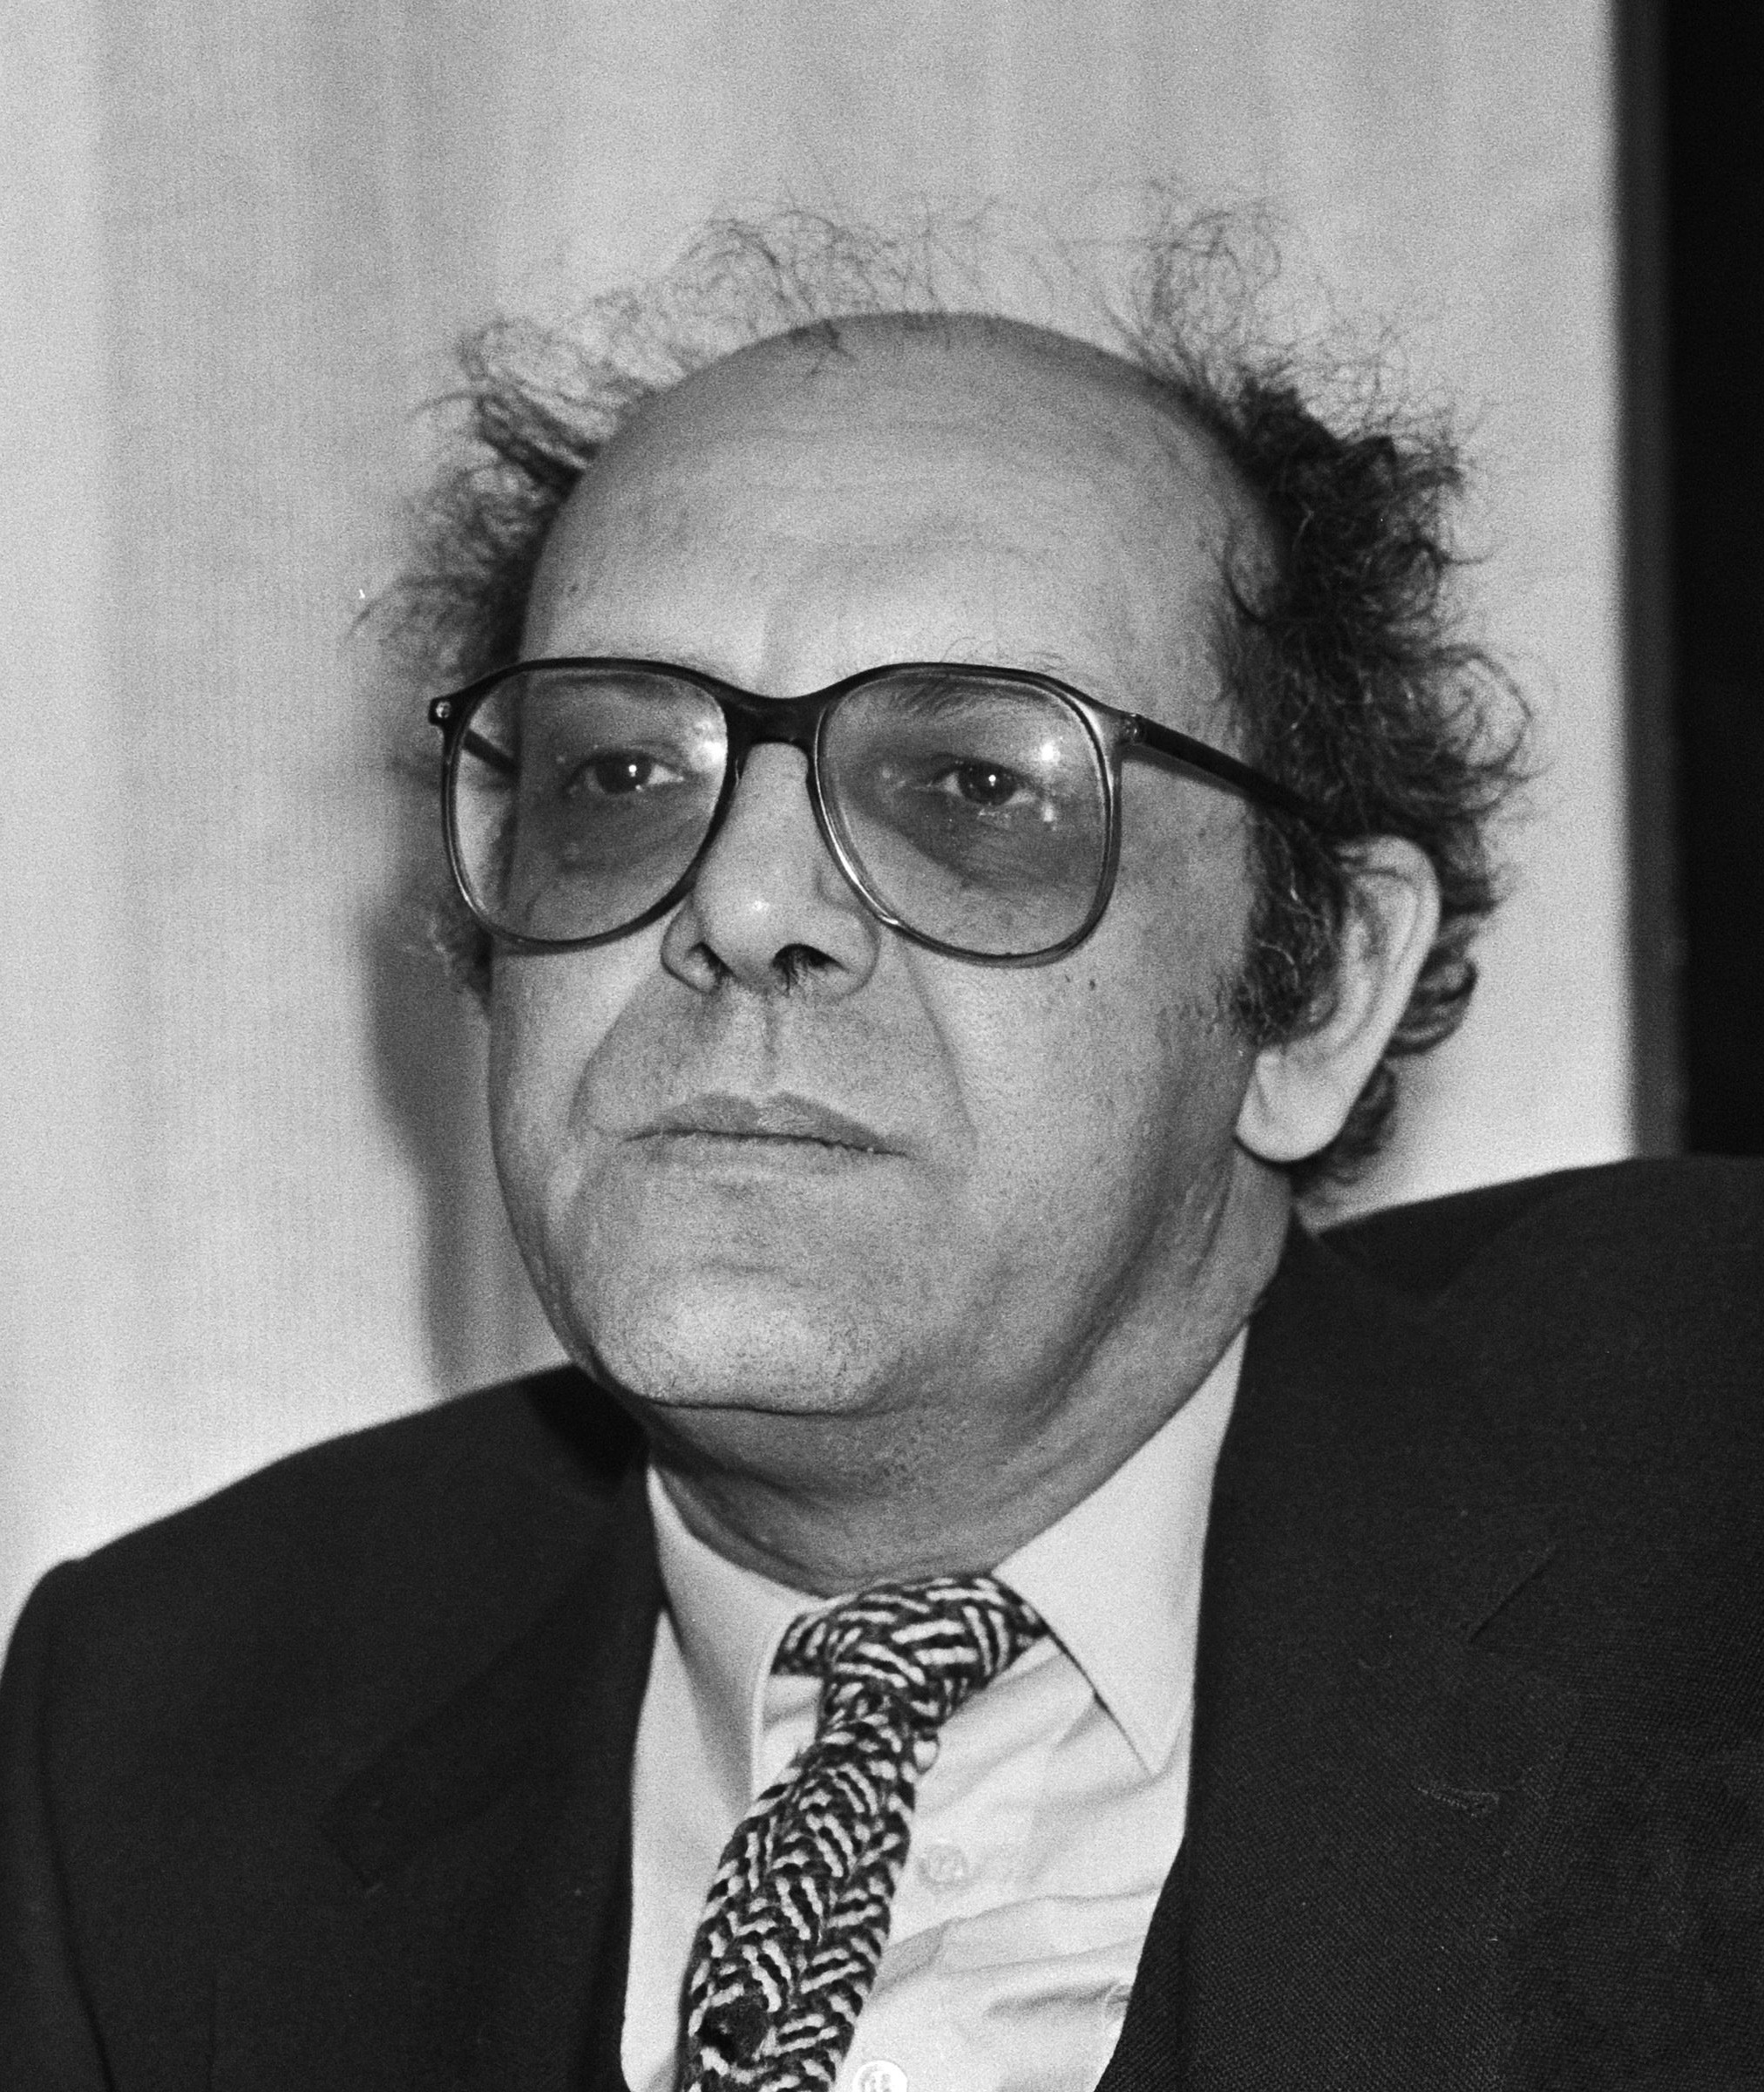 Mengelberg in 1985